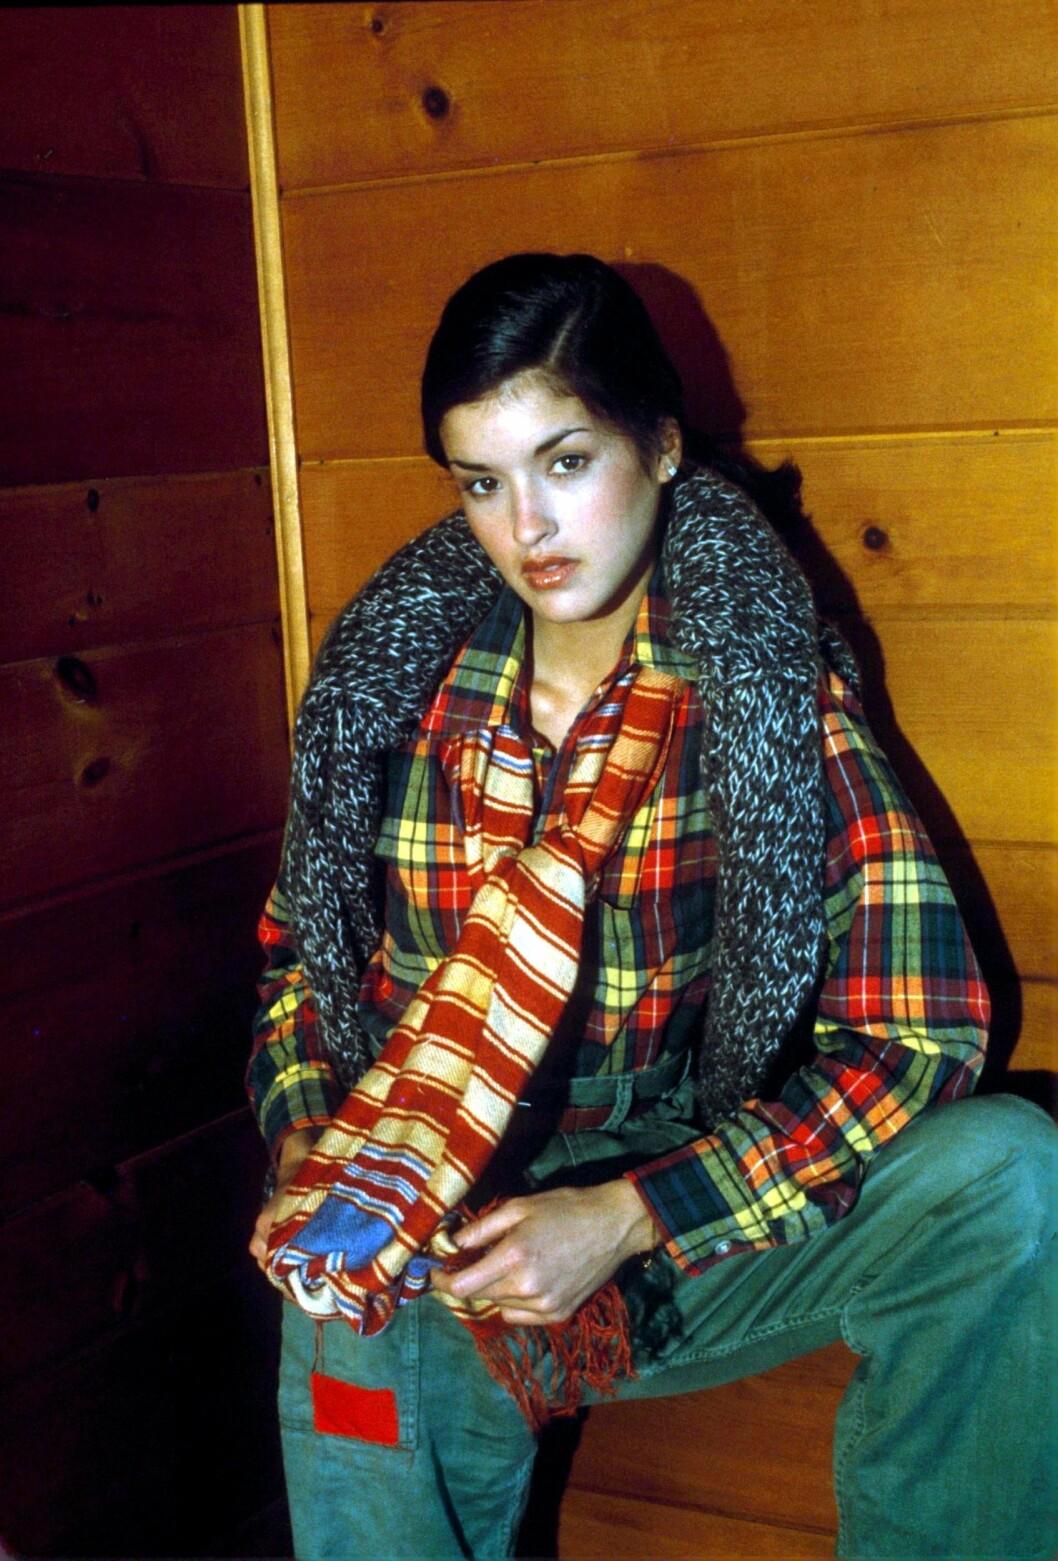 Janice Dickinson i 1977. Foto: REX/Media Press/All Over Press